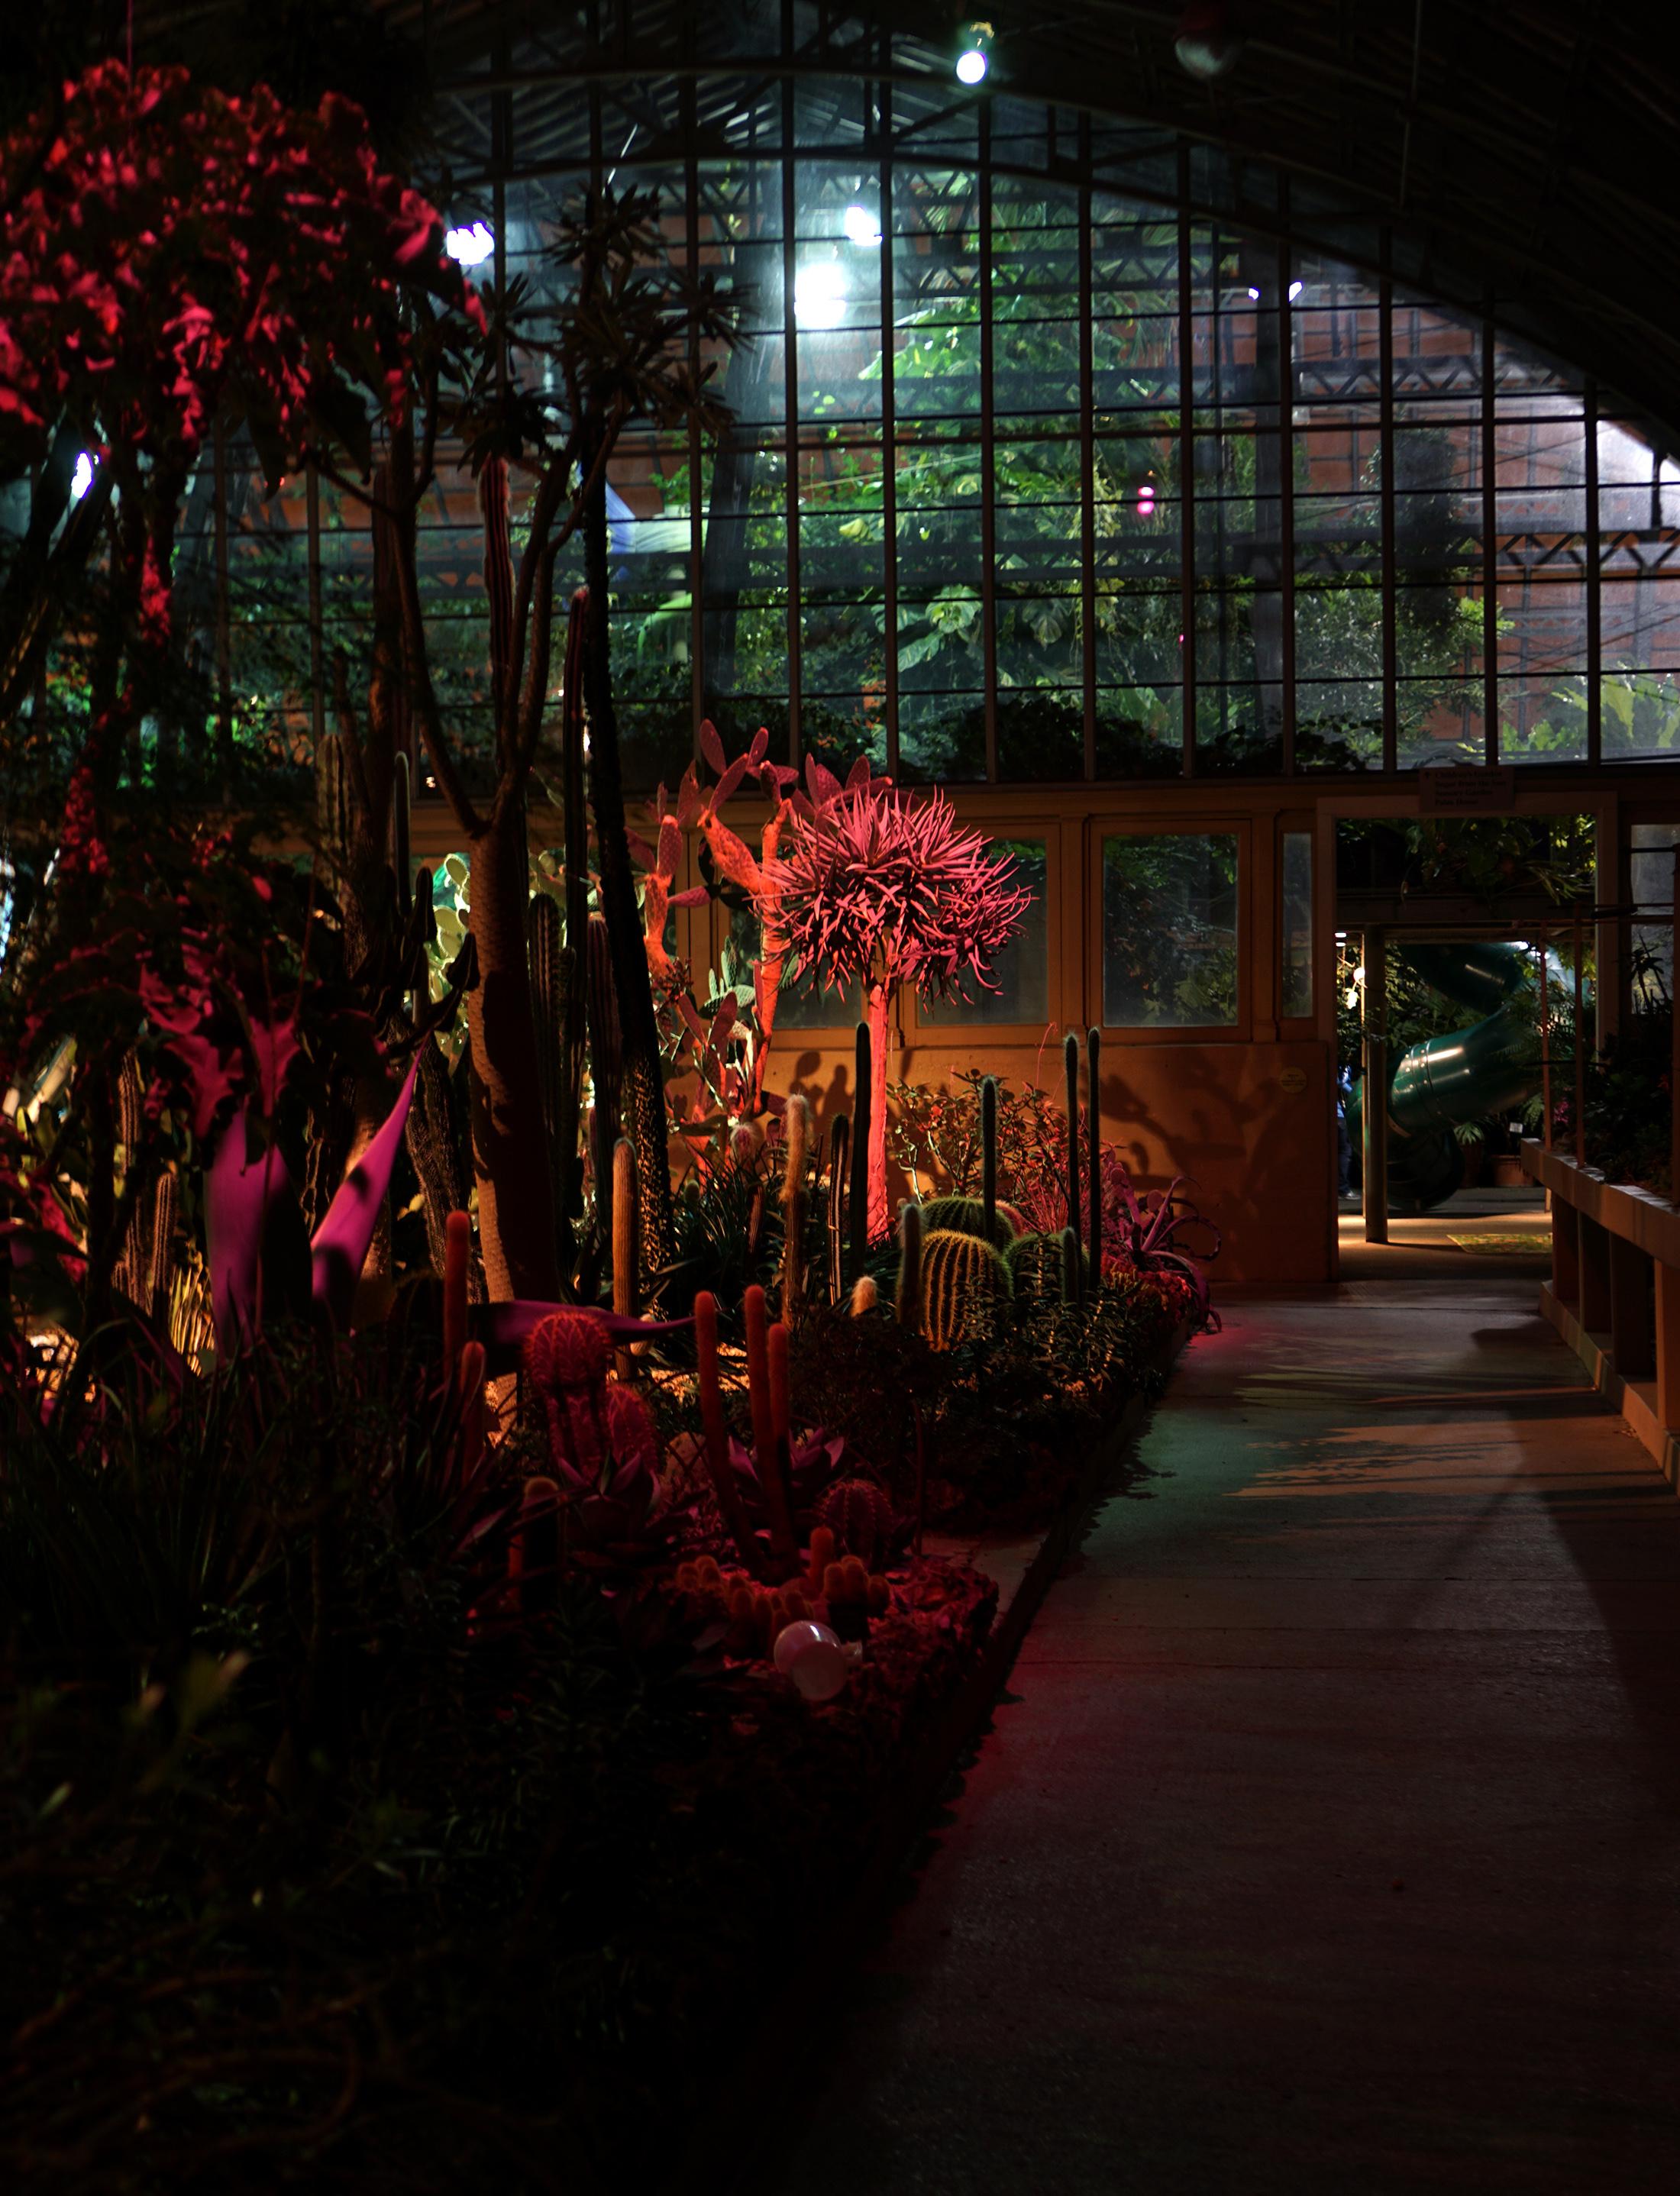 The desert room, Garfield Park Conservatory at night, Chicago / Darker than Green